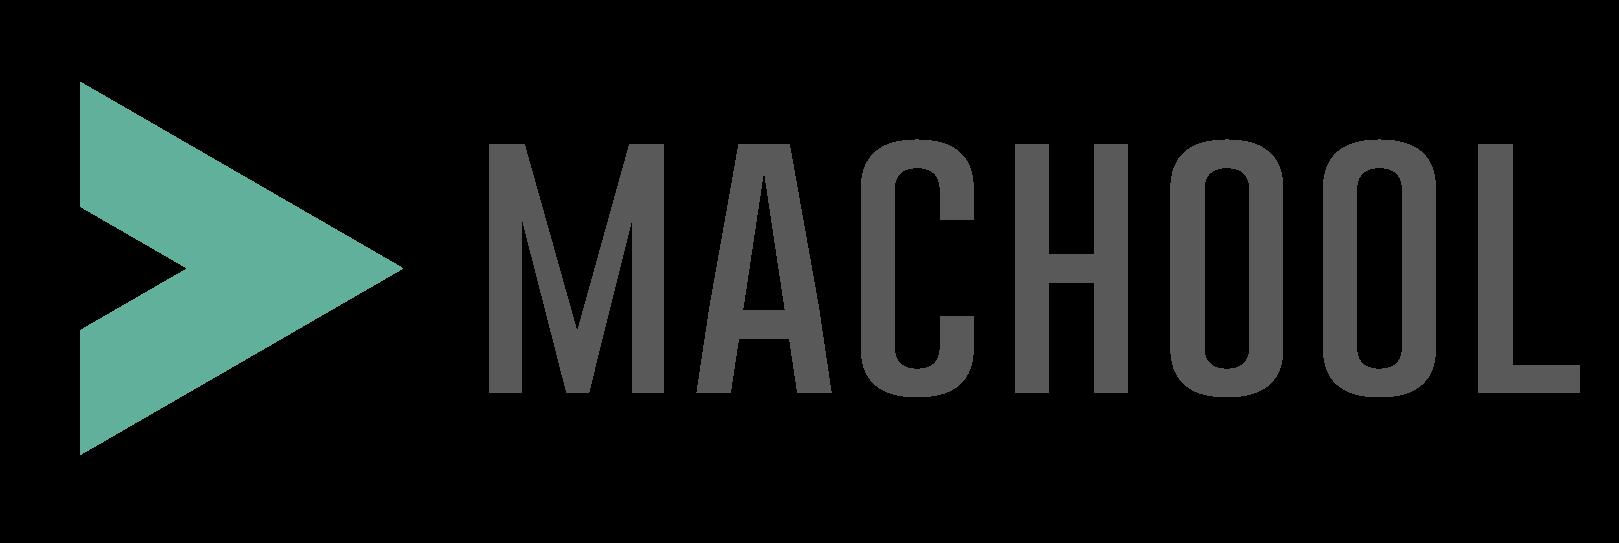 Machool Logo